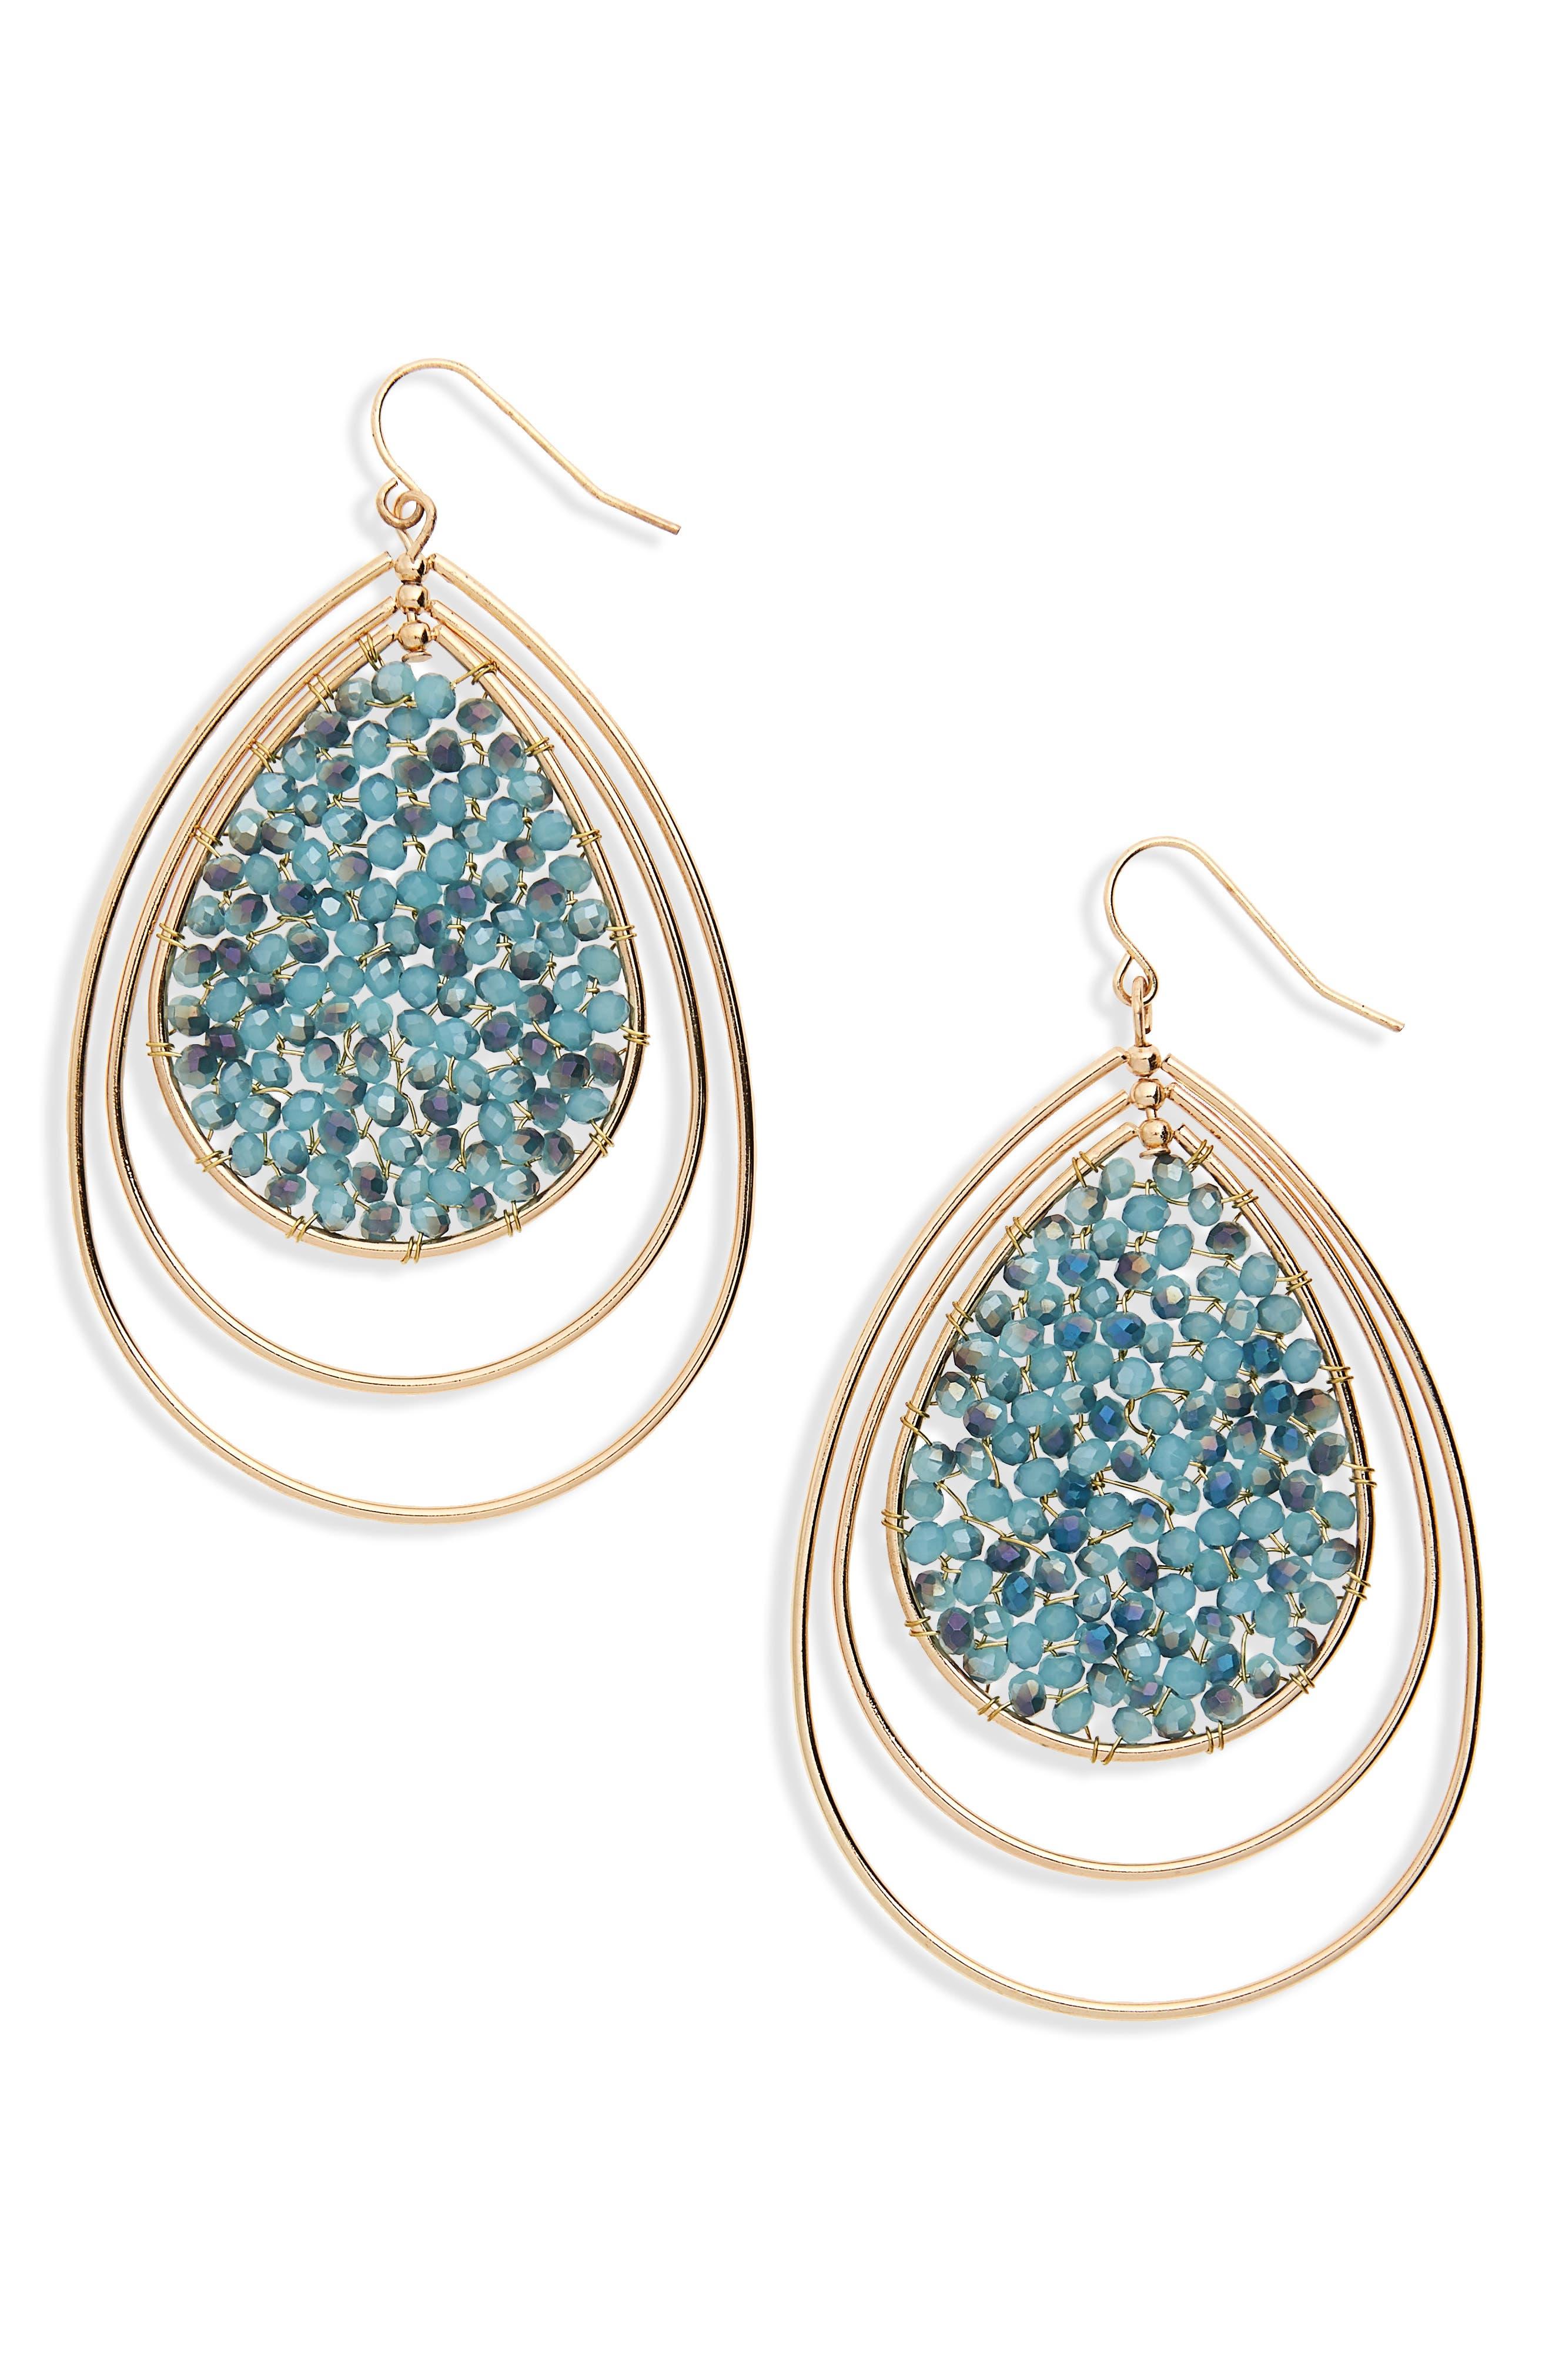 Triple Teardrop Earrings,                             Main thumbnail 1, color,                             Blue